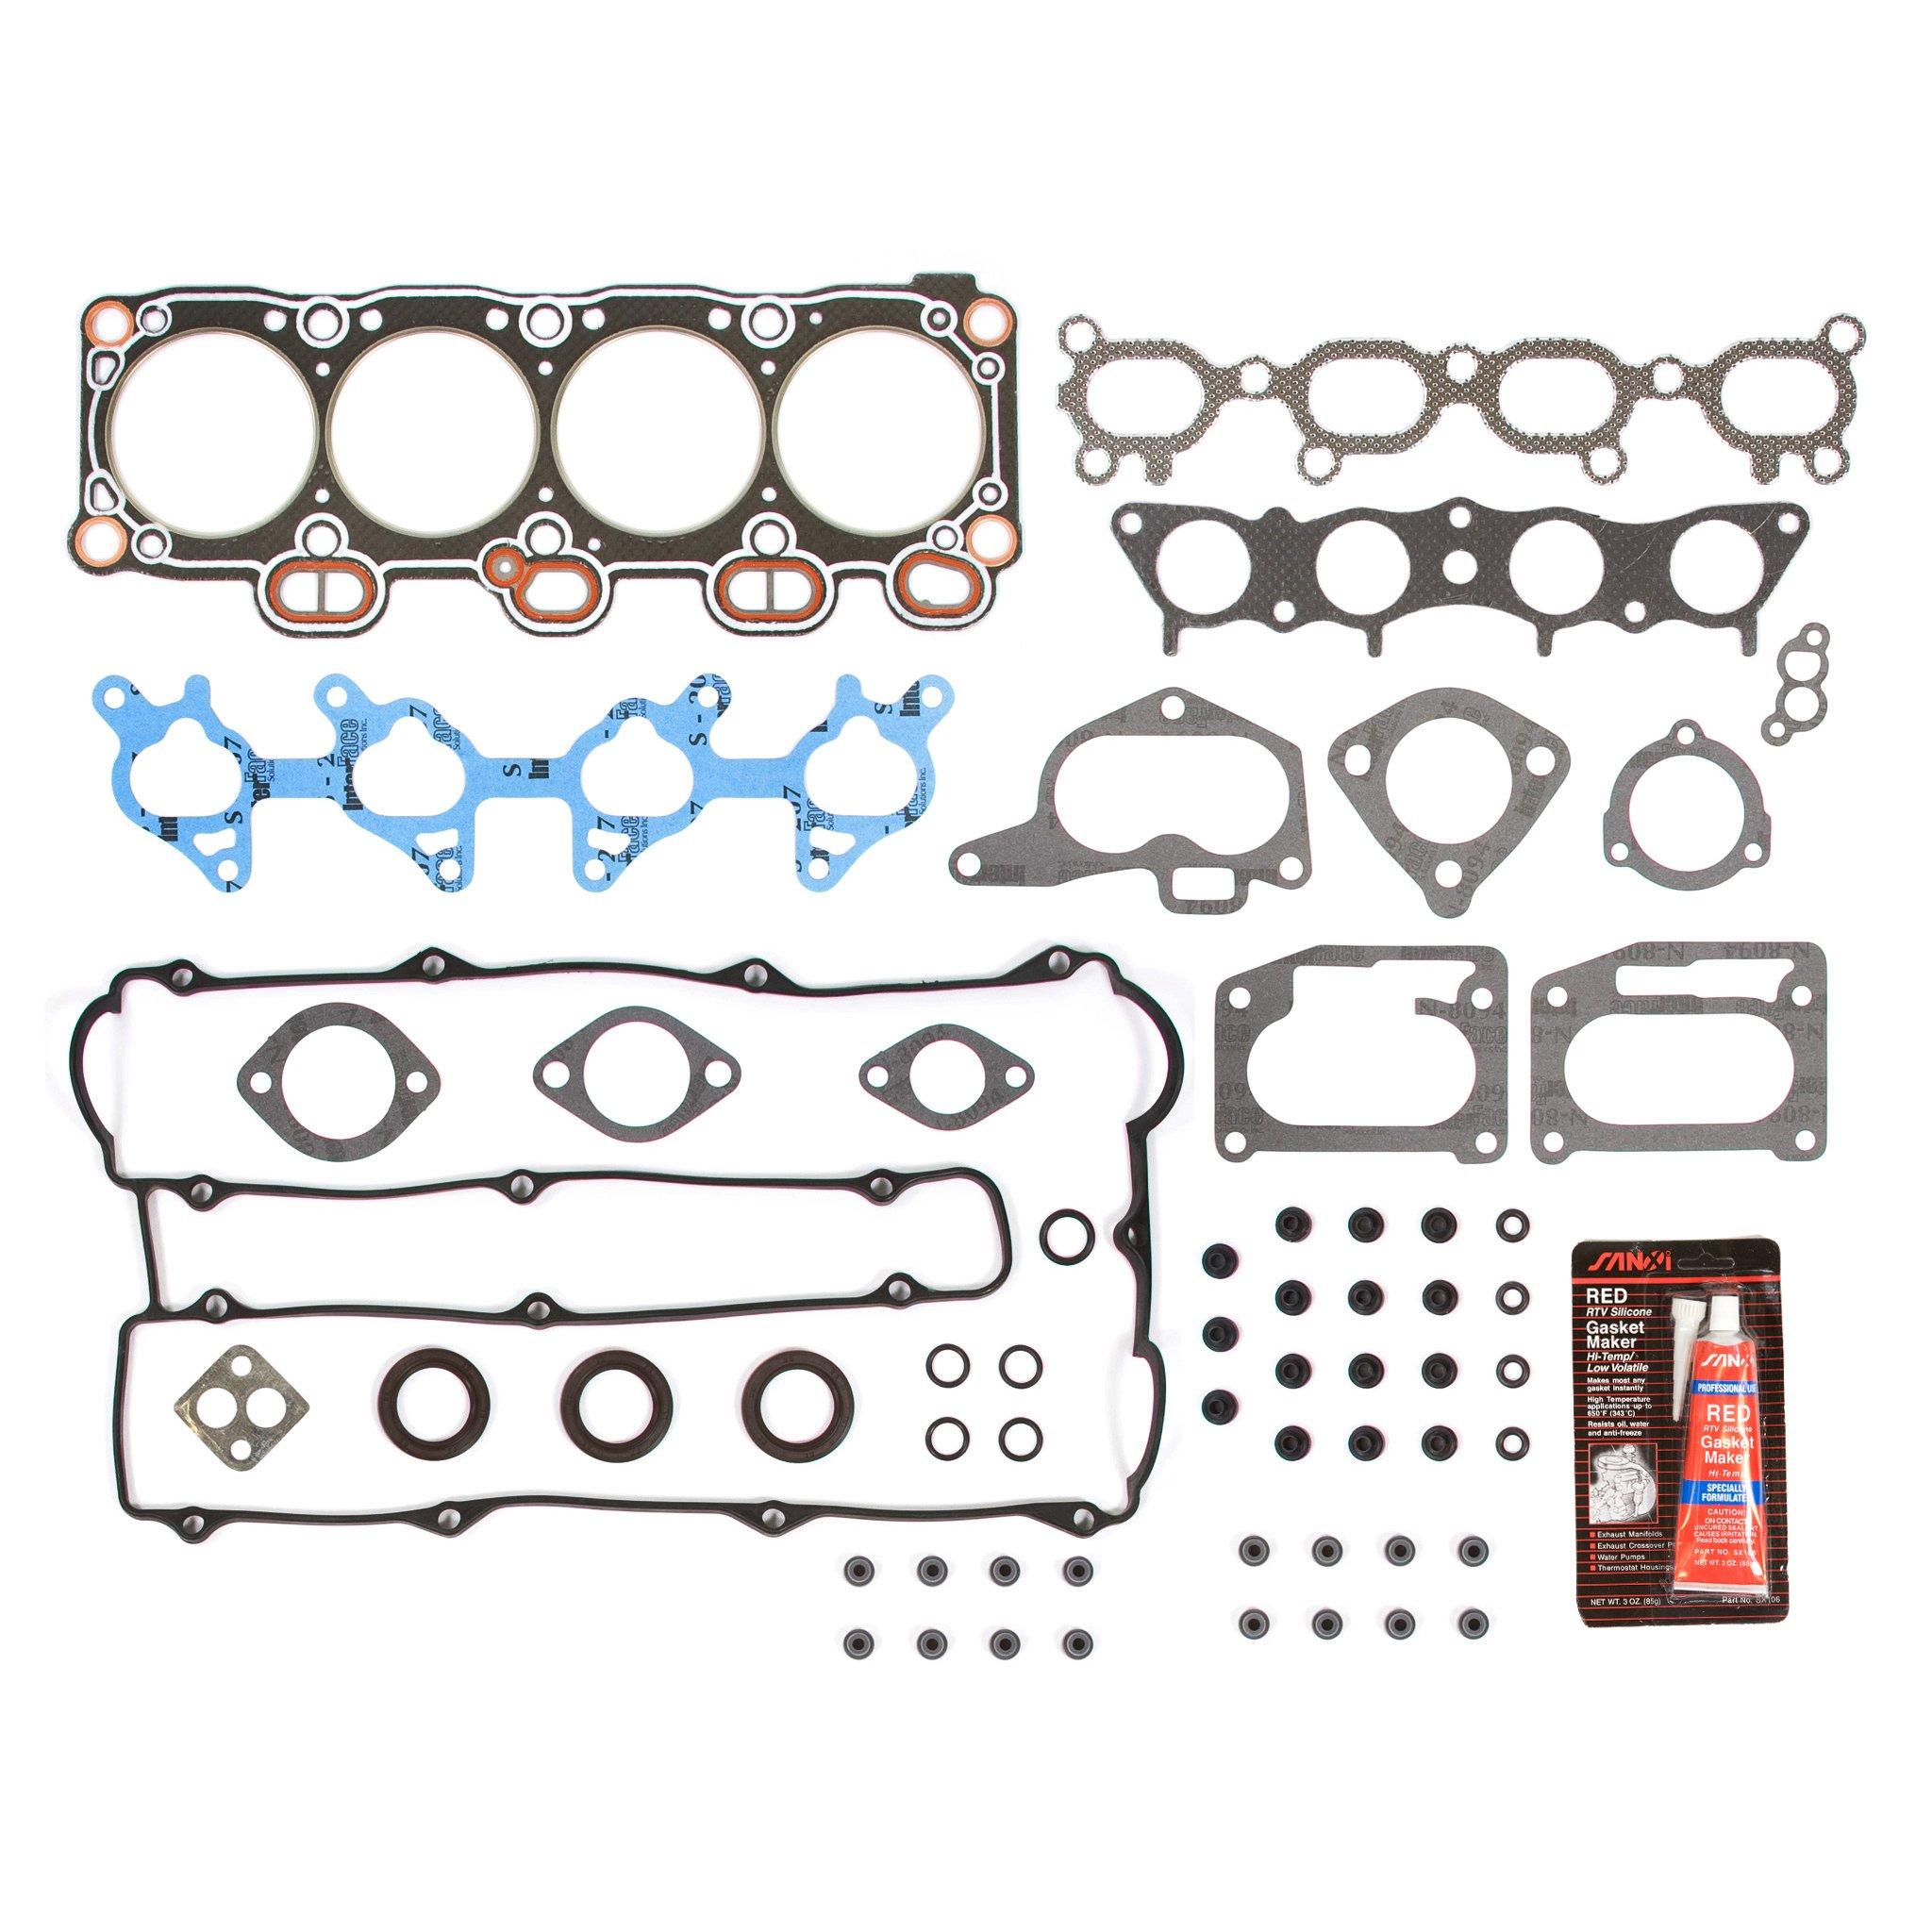 Evergreen HS4038 Cylinder Head Gasket Set